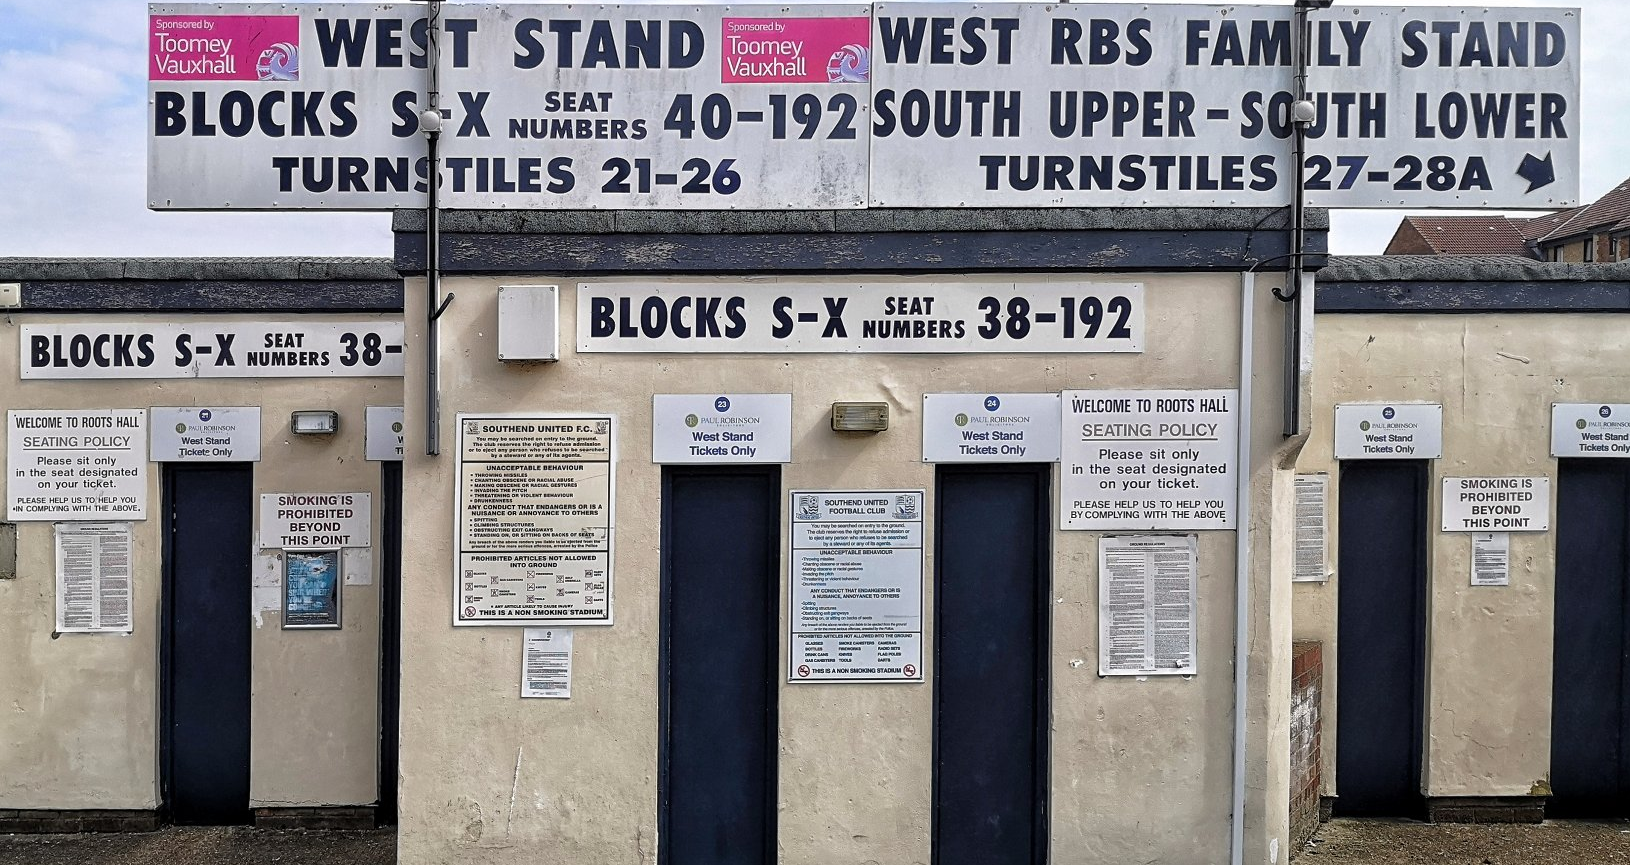 Image copyright of footballstadiumphotography.co.uk